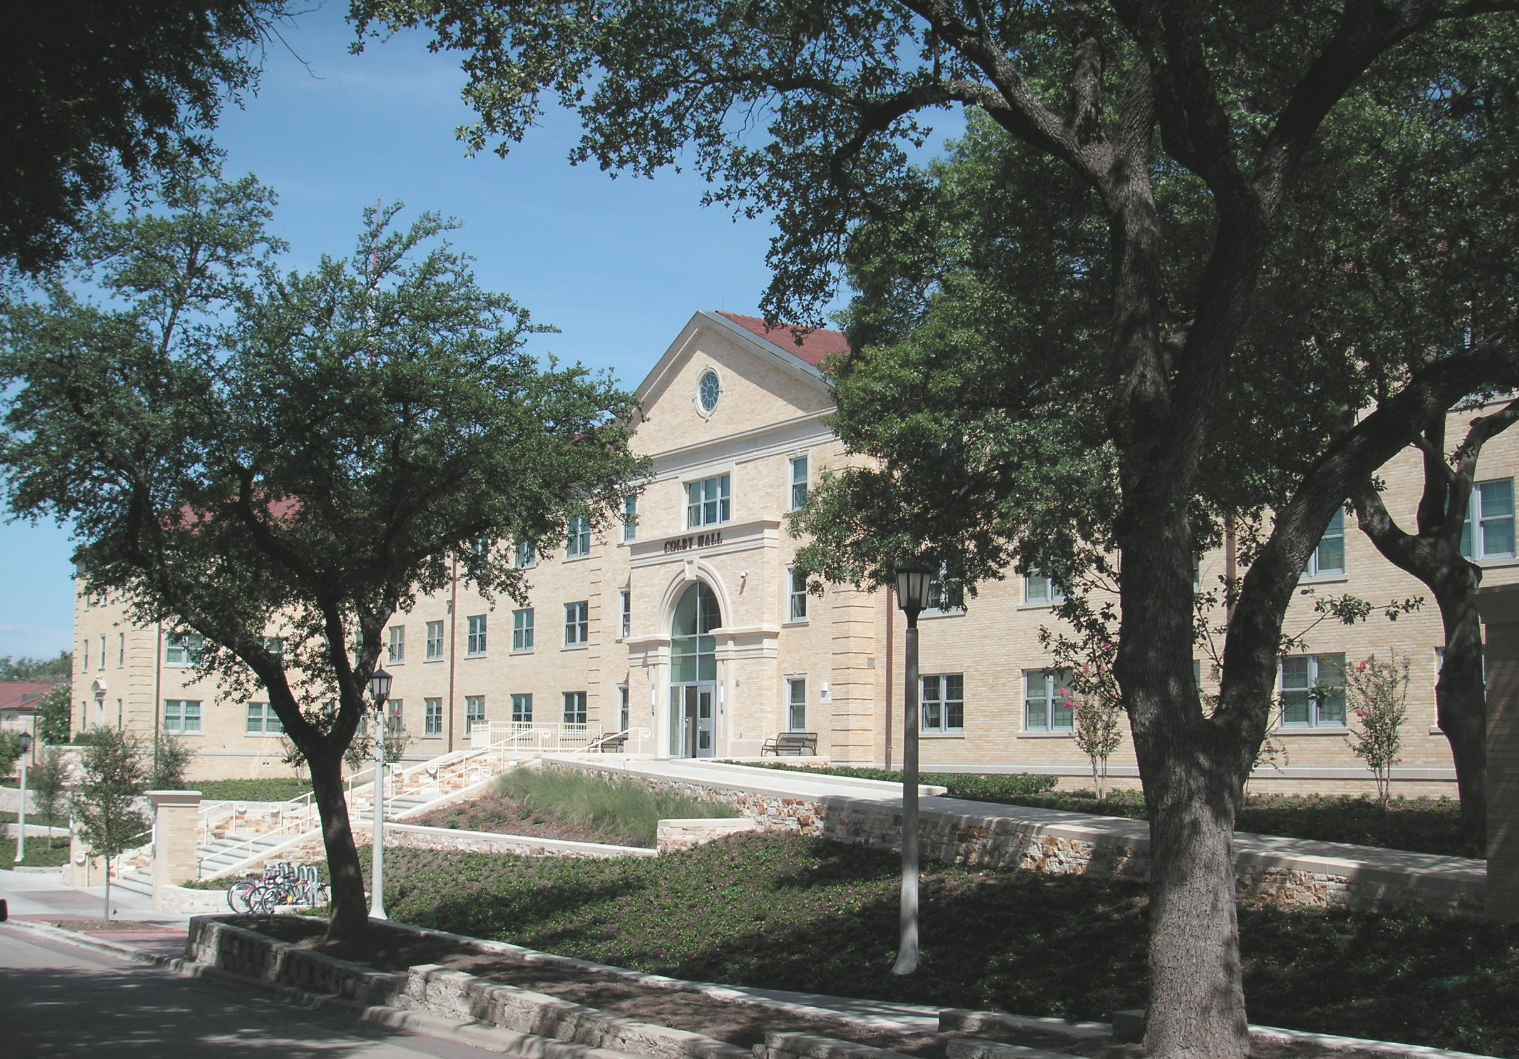 Colby Hall